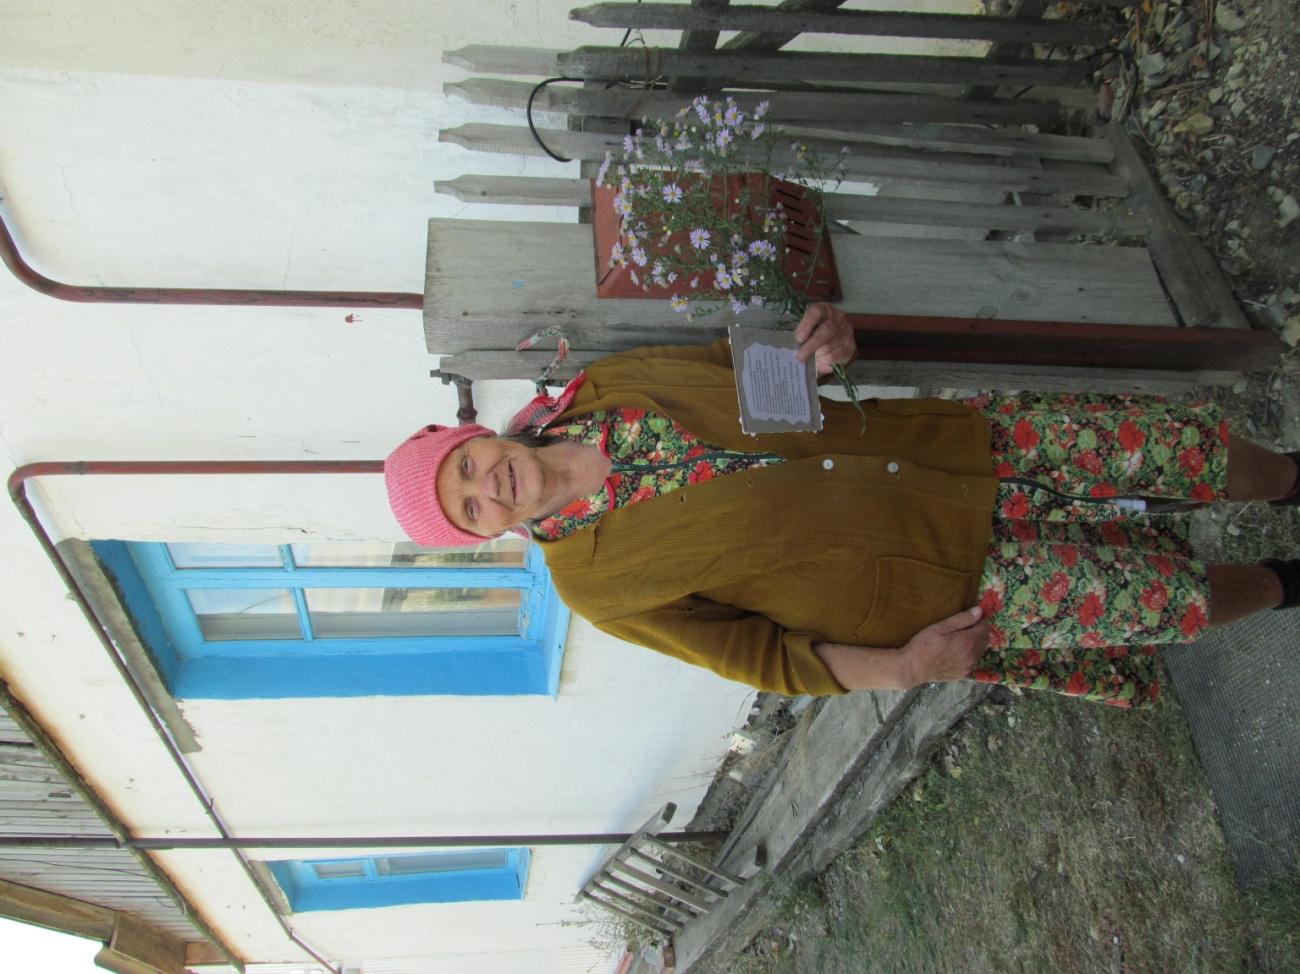 D:\фото\фото день учителя +день села\IMG_0693.JPG